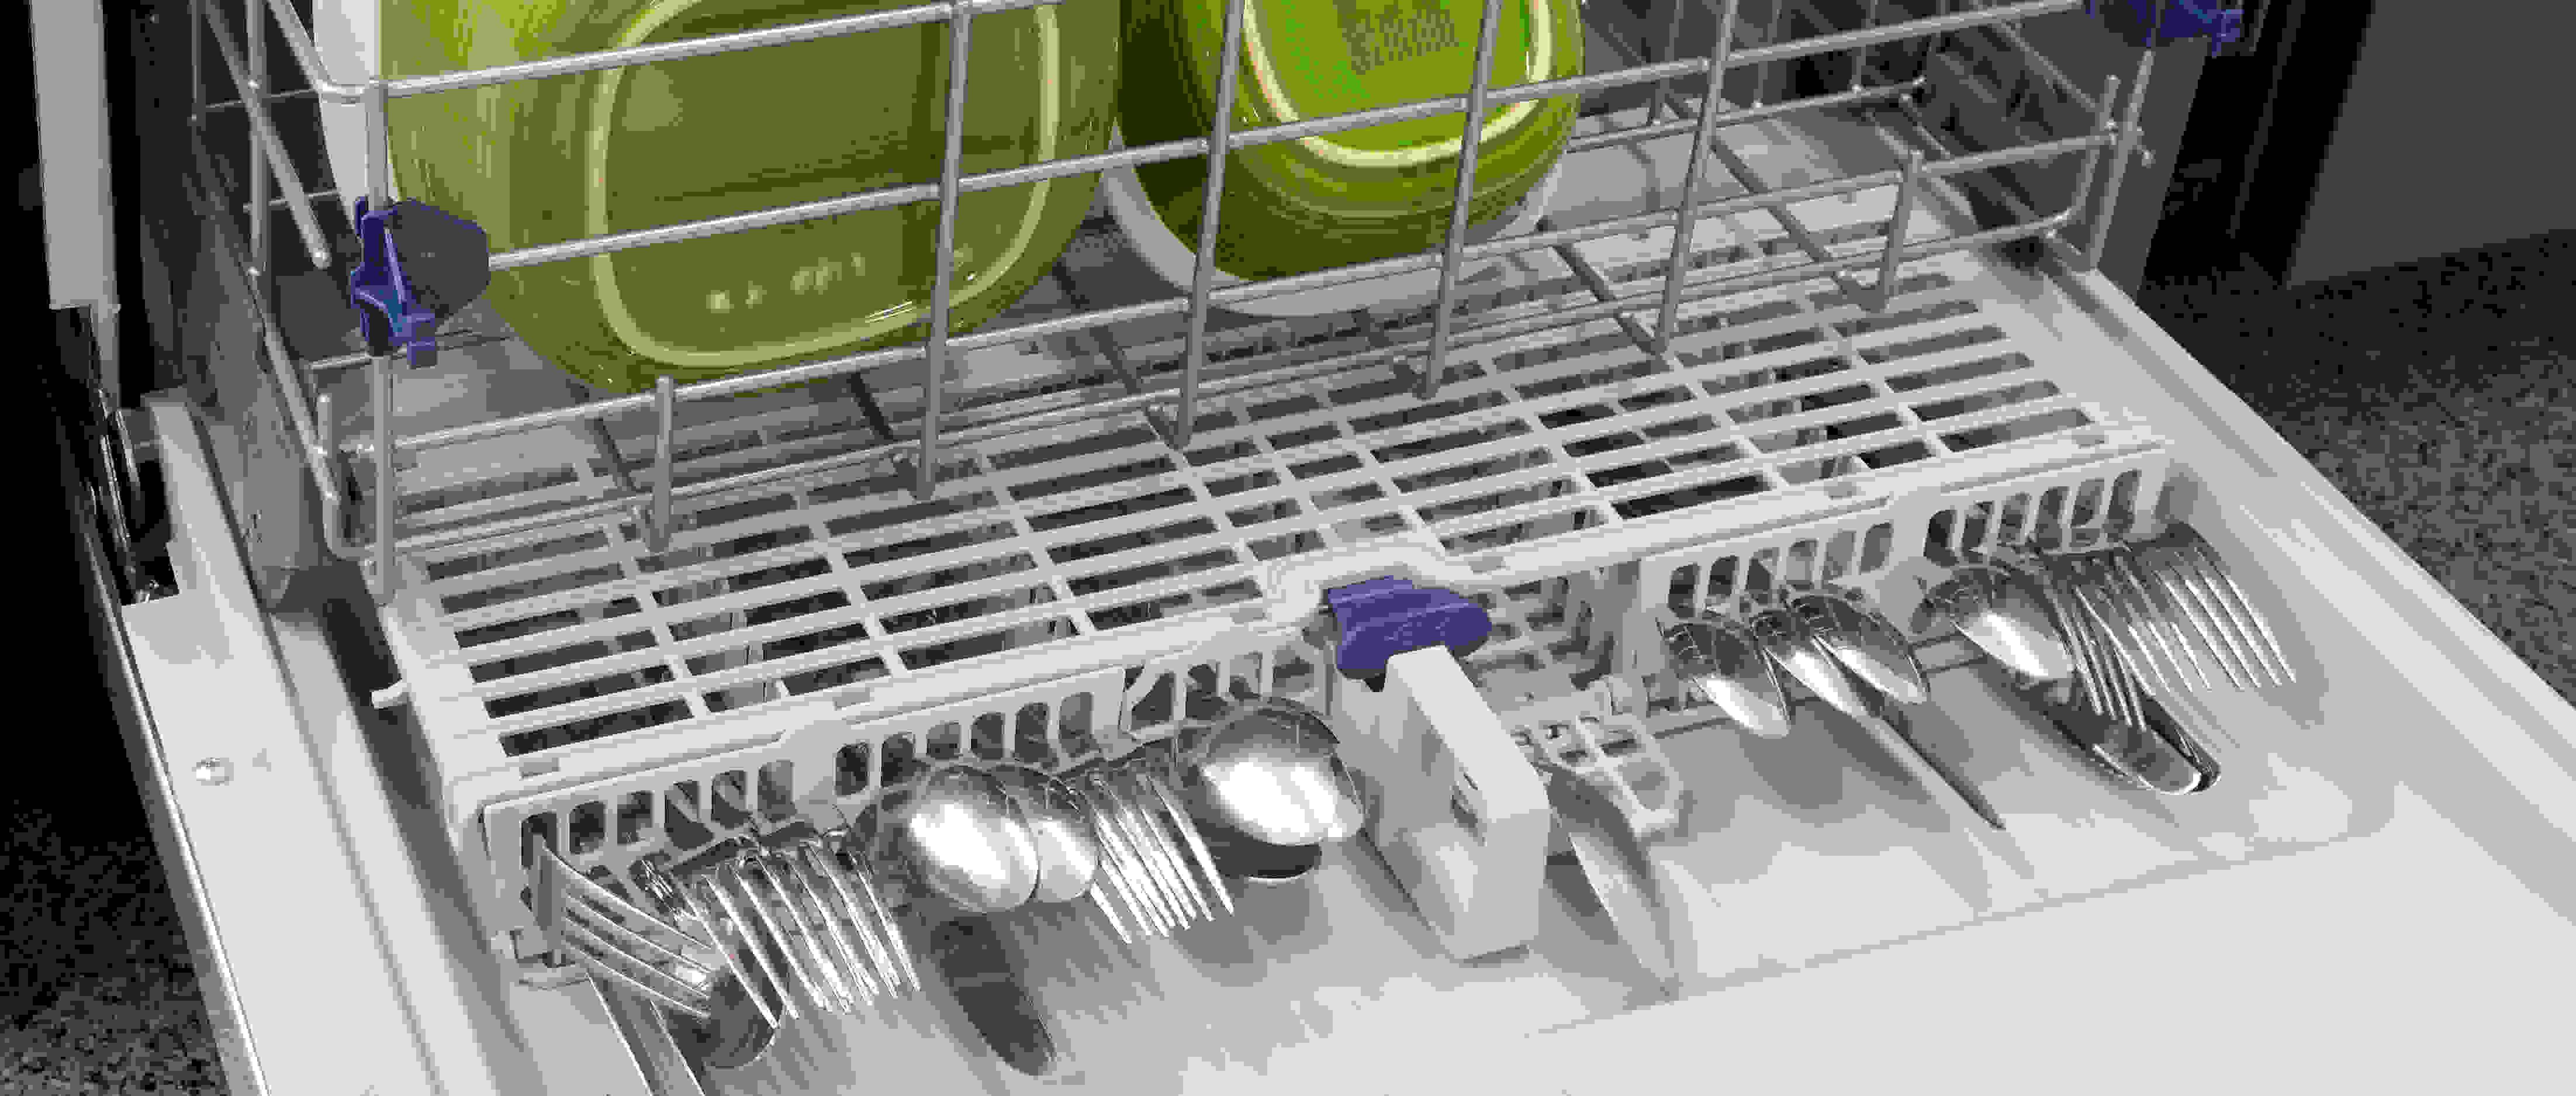 Whirlpool WDF540PADM cutlery basket on door